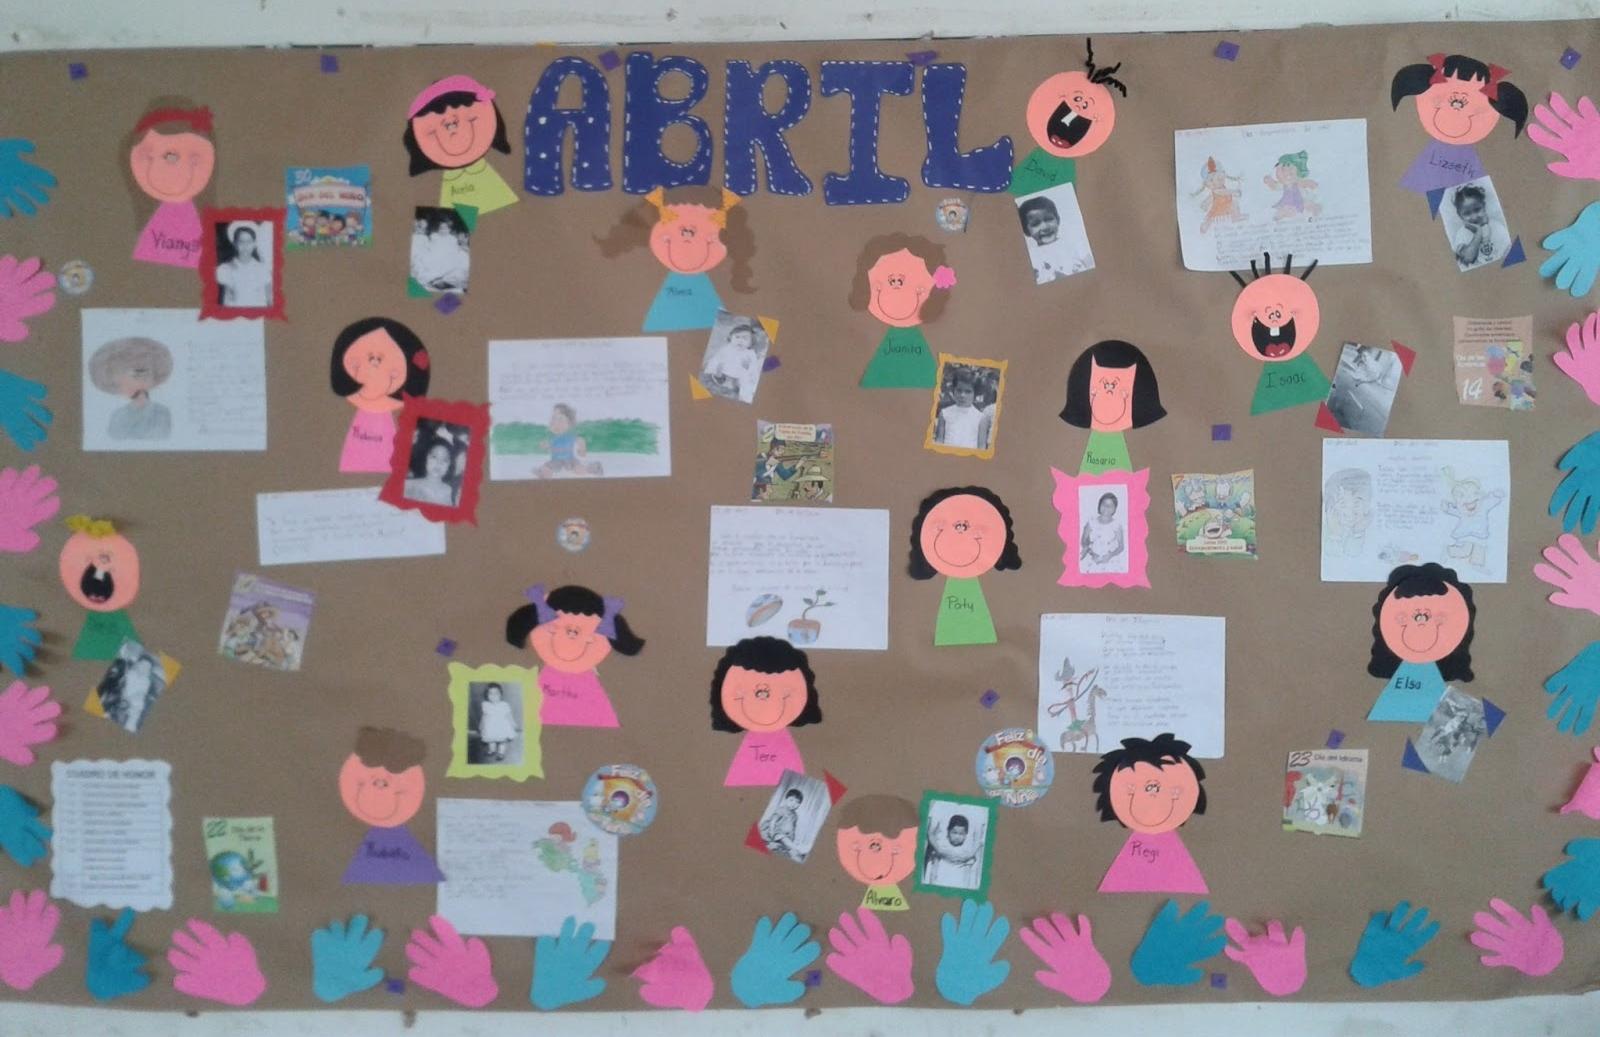 Periodico mural mes de abril 4 imagenes educativas for Concepto de periodico mural